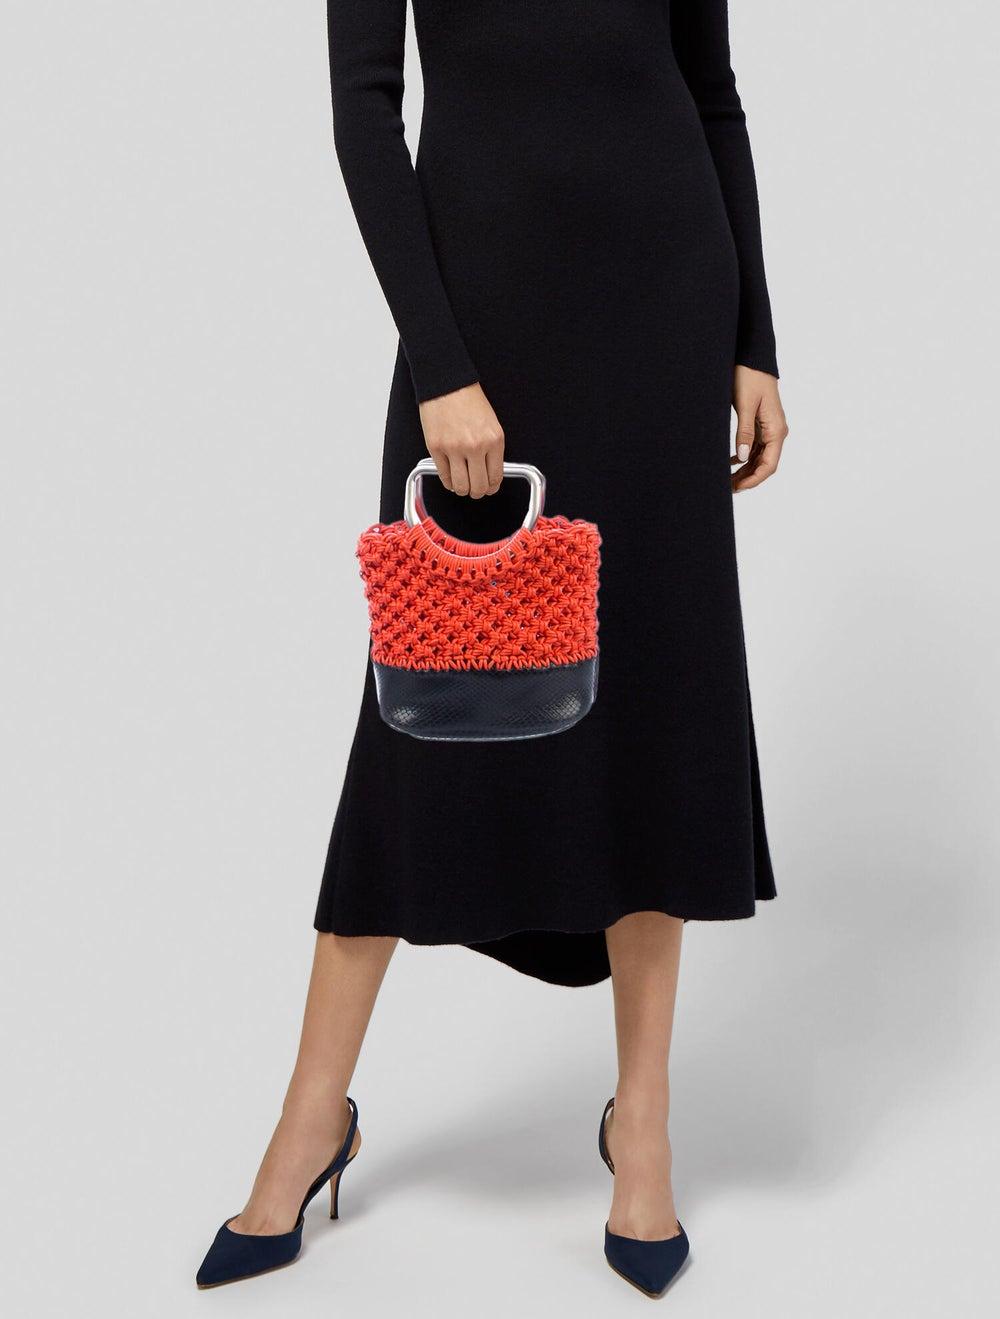 Proenza Schouler Small Market Macrame Bag Orange - image 2